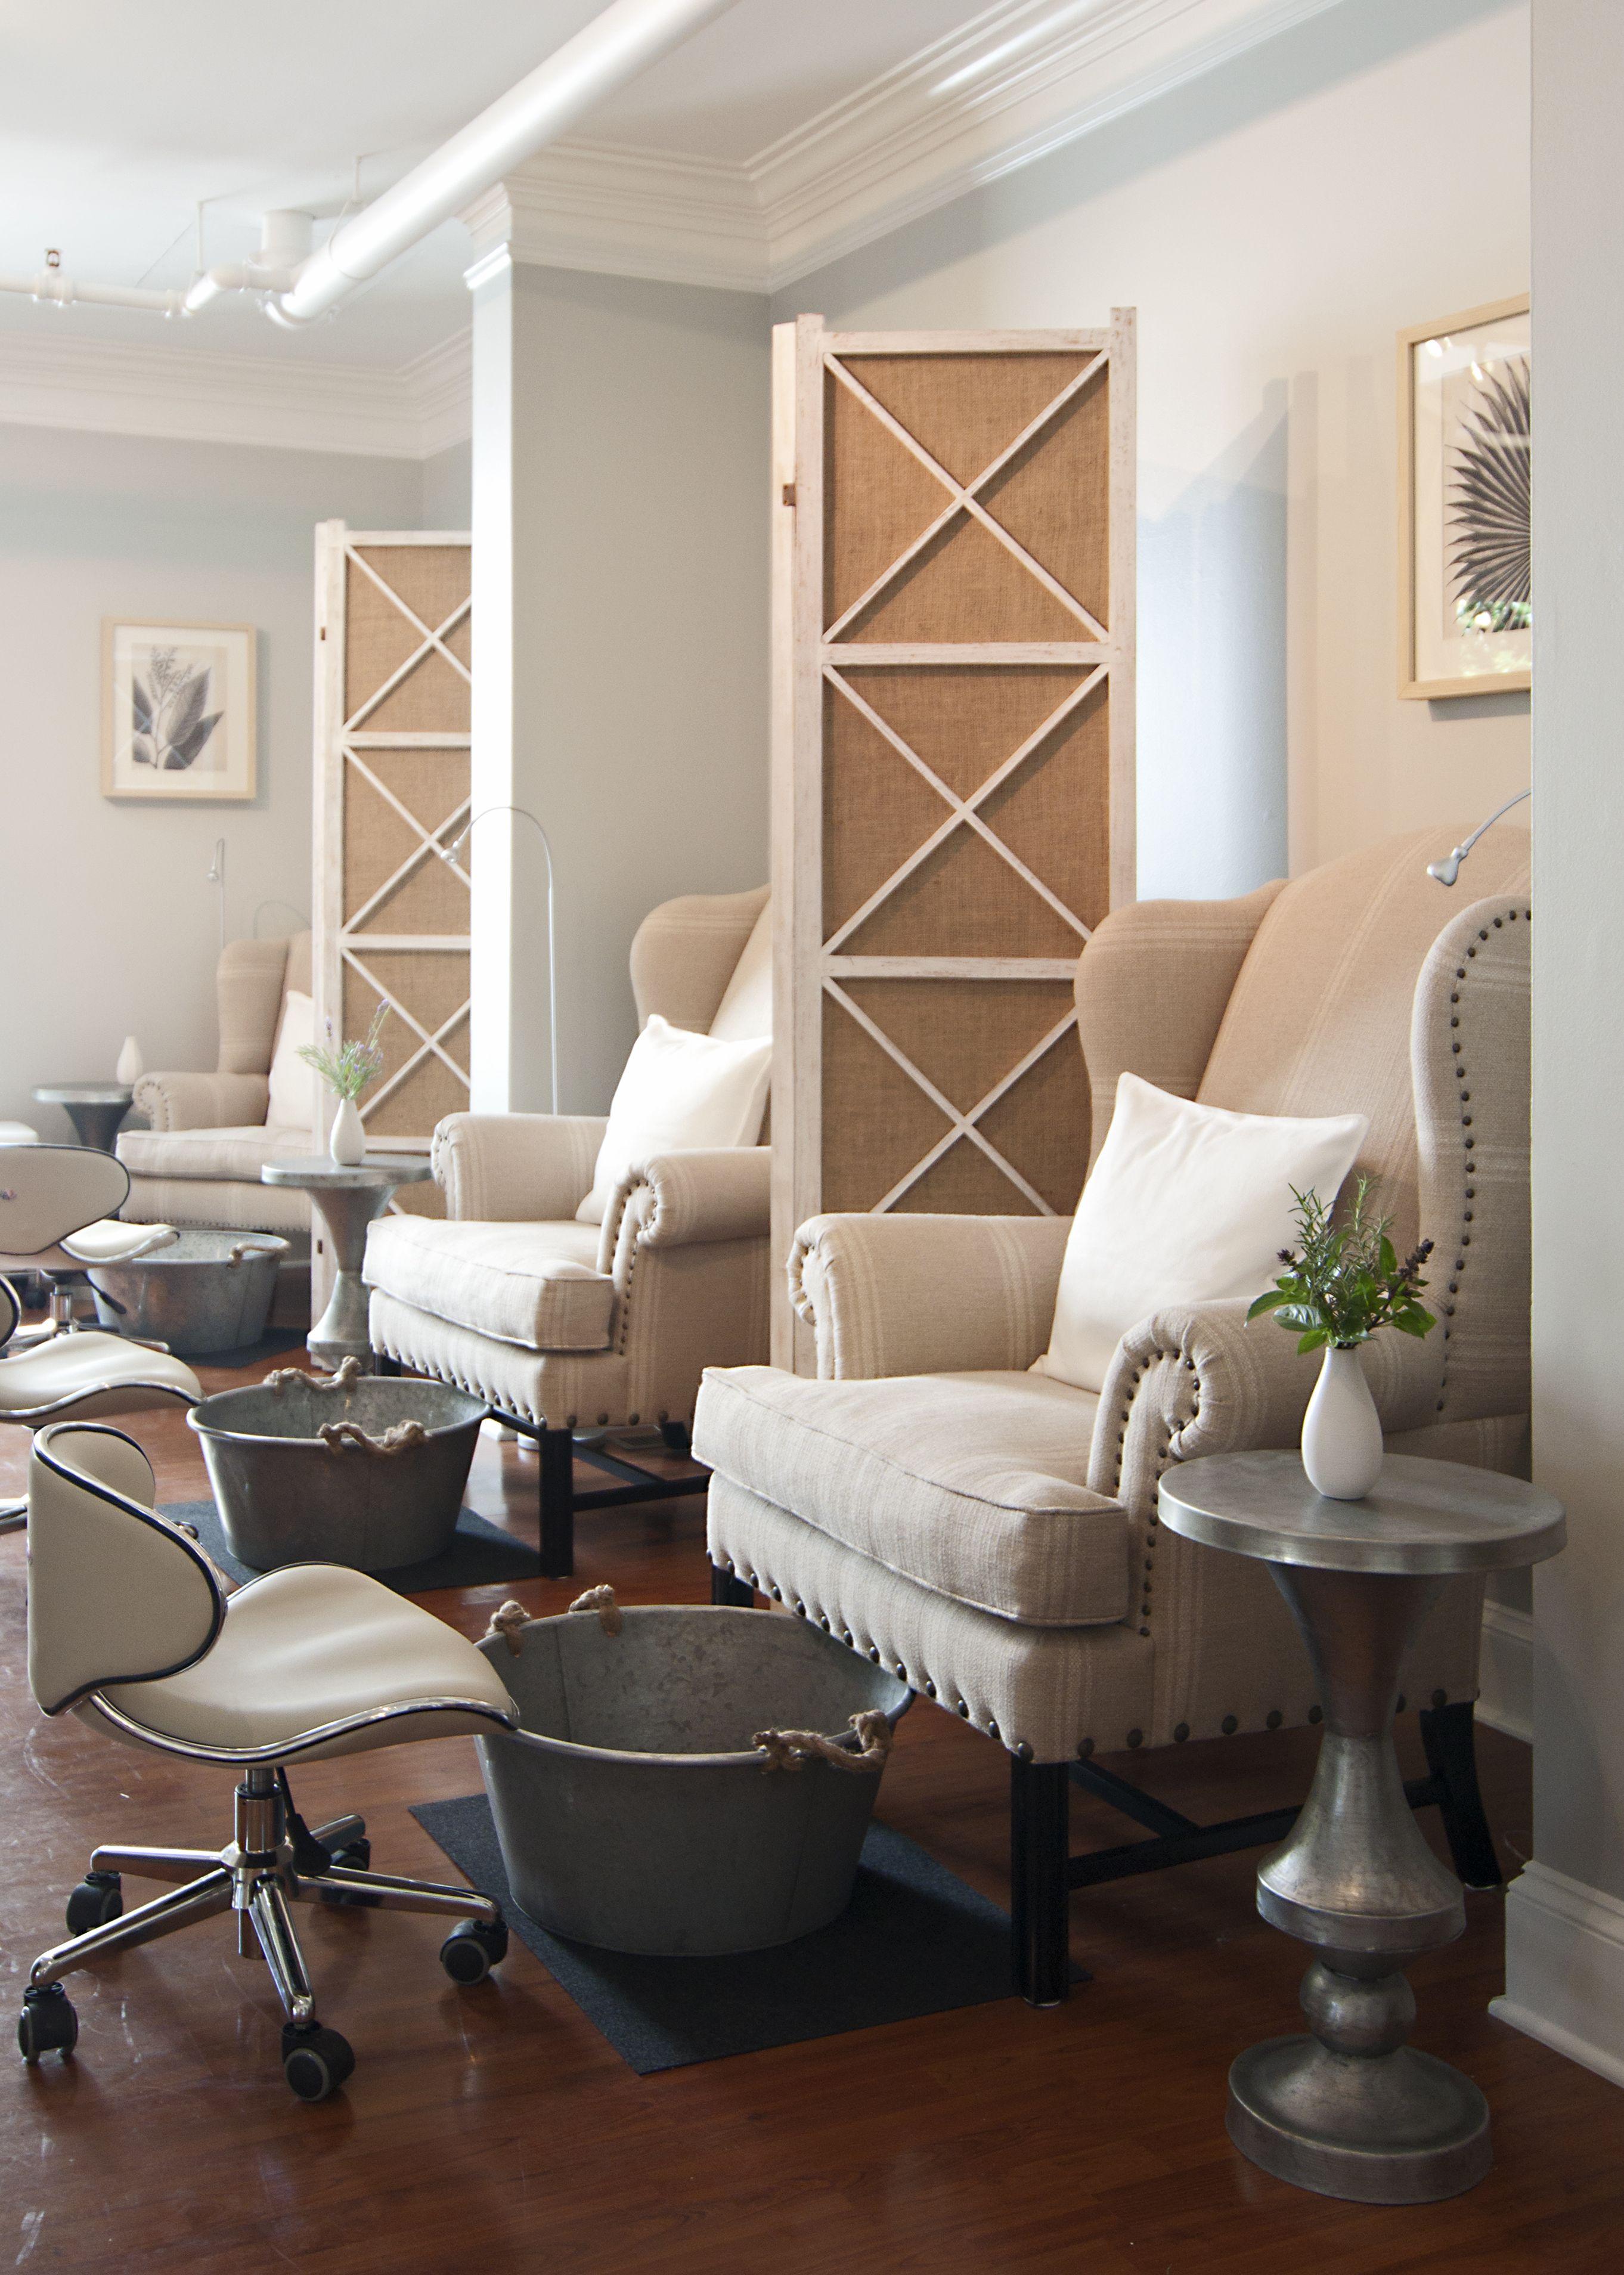 is interior design for me nail salon for me nail salon pinterest me gustan el detalle de la separacion, para la privacidad del cliente. Pedicures  are ...